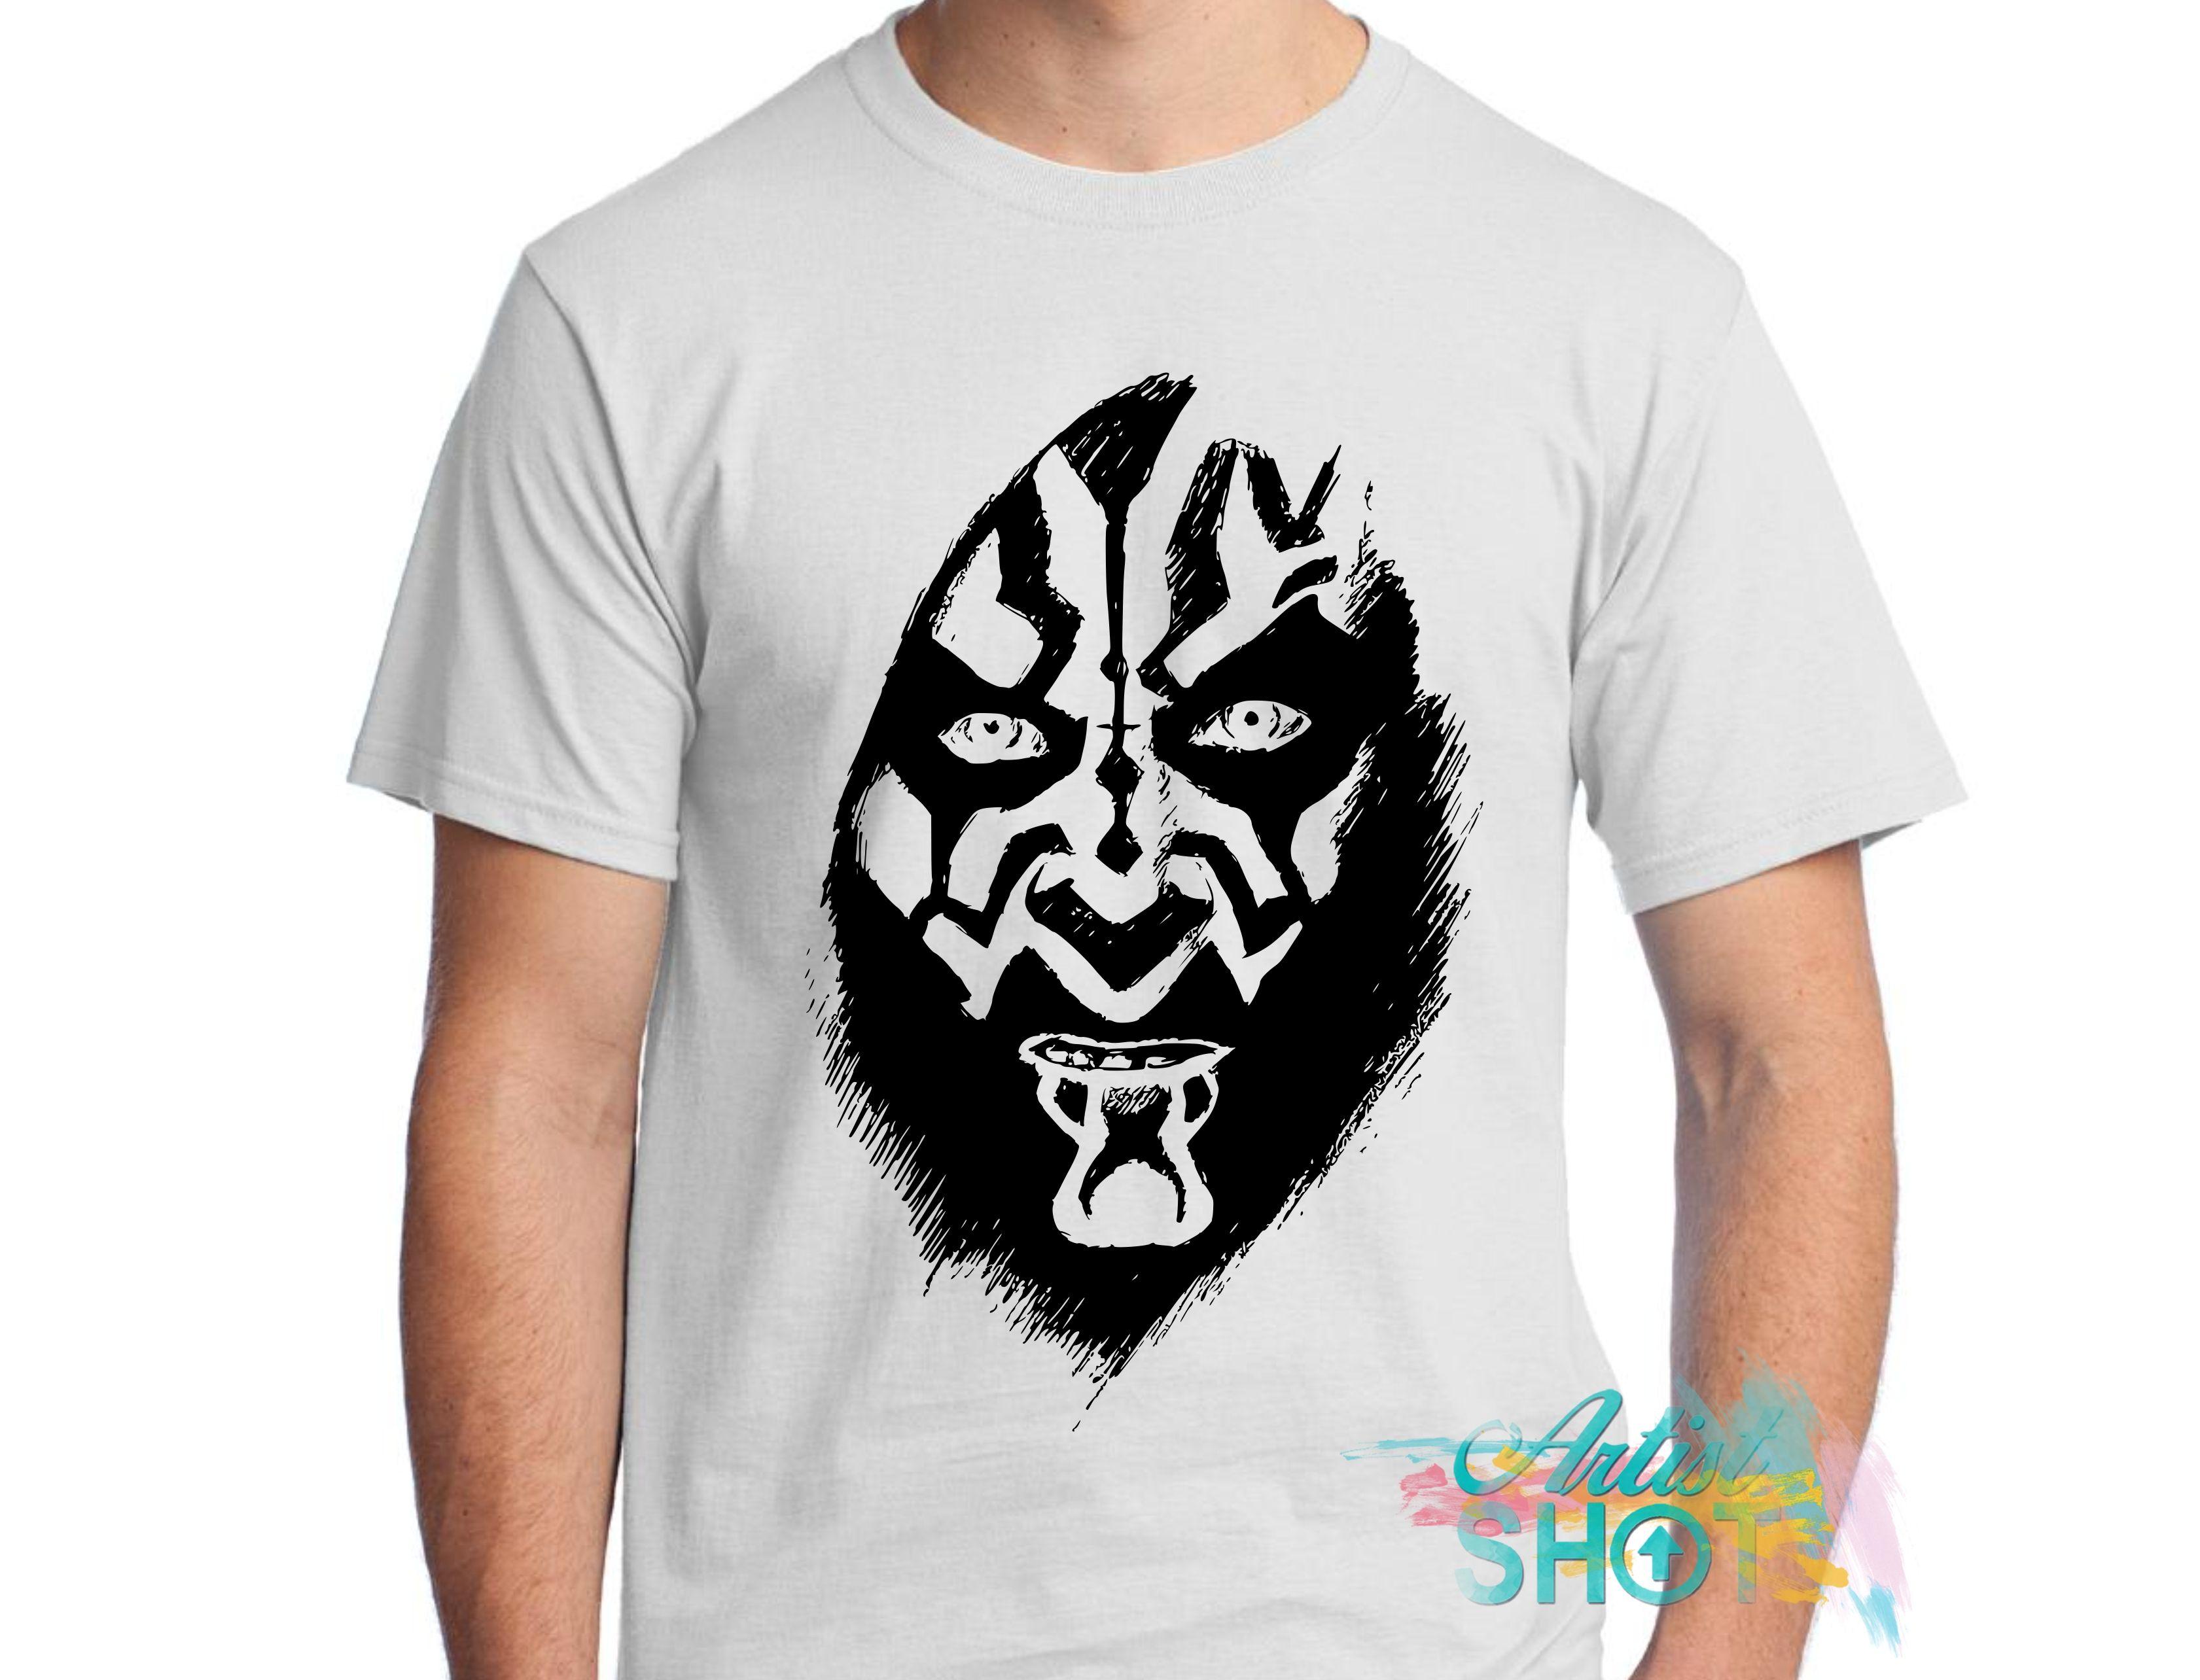 Pin by Artistshot on artistshot | T shirt, Mens tshirts ...